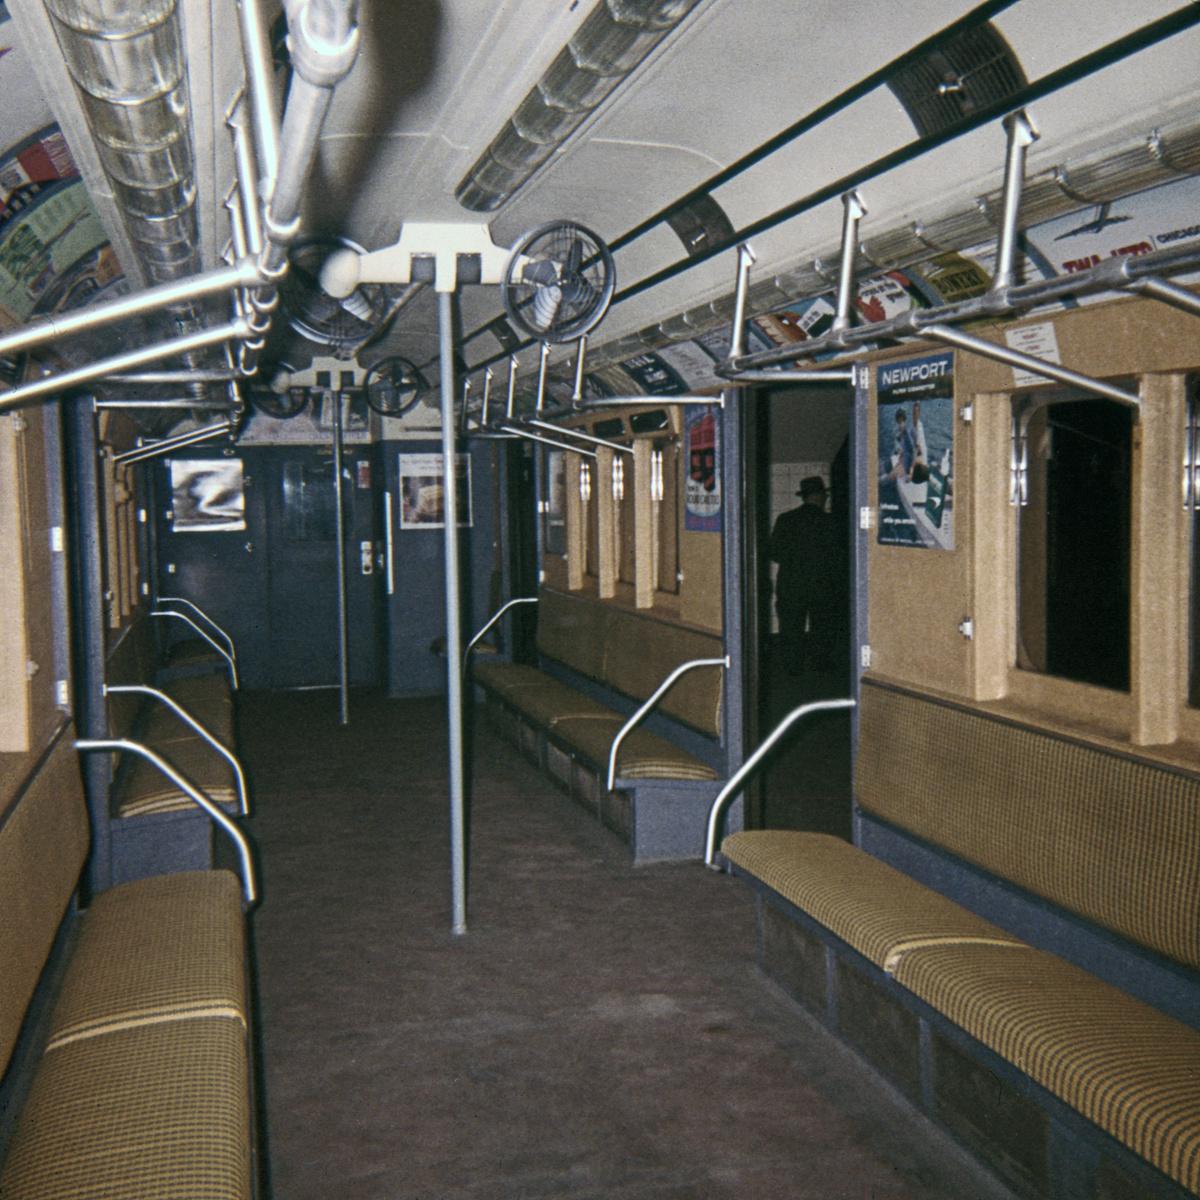 (711k, 1200x1200)<br><b>Country:</b> United States<br><b>City:</b> New York<br><b>System:</b> New York City Transit<br><b>Line:</b> IRT Flushing Line<br><b>Car:</b> R-14 (American Car & Foundry, 1949) 5837 <br><b>Collection of:</b> David Pirmann<br><b>Date:</b> 4/30/1962<br><b>Viewed (this week/total):</b> 14 / 16579